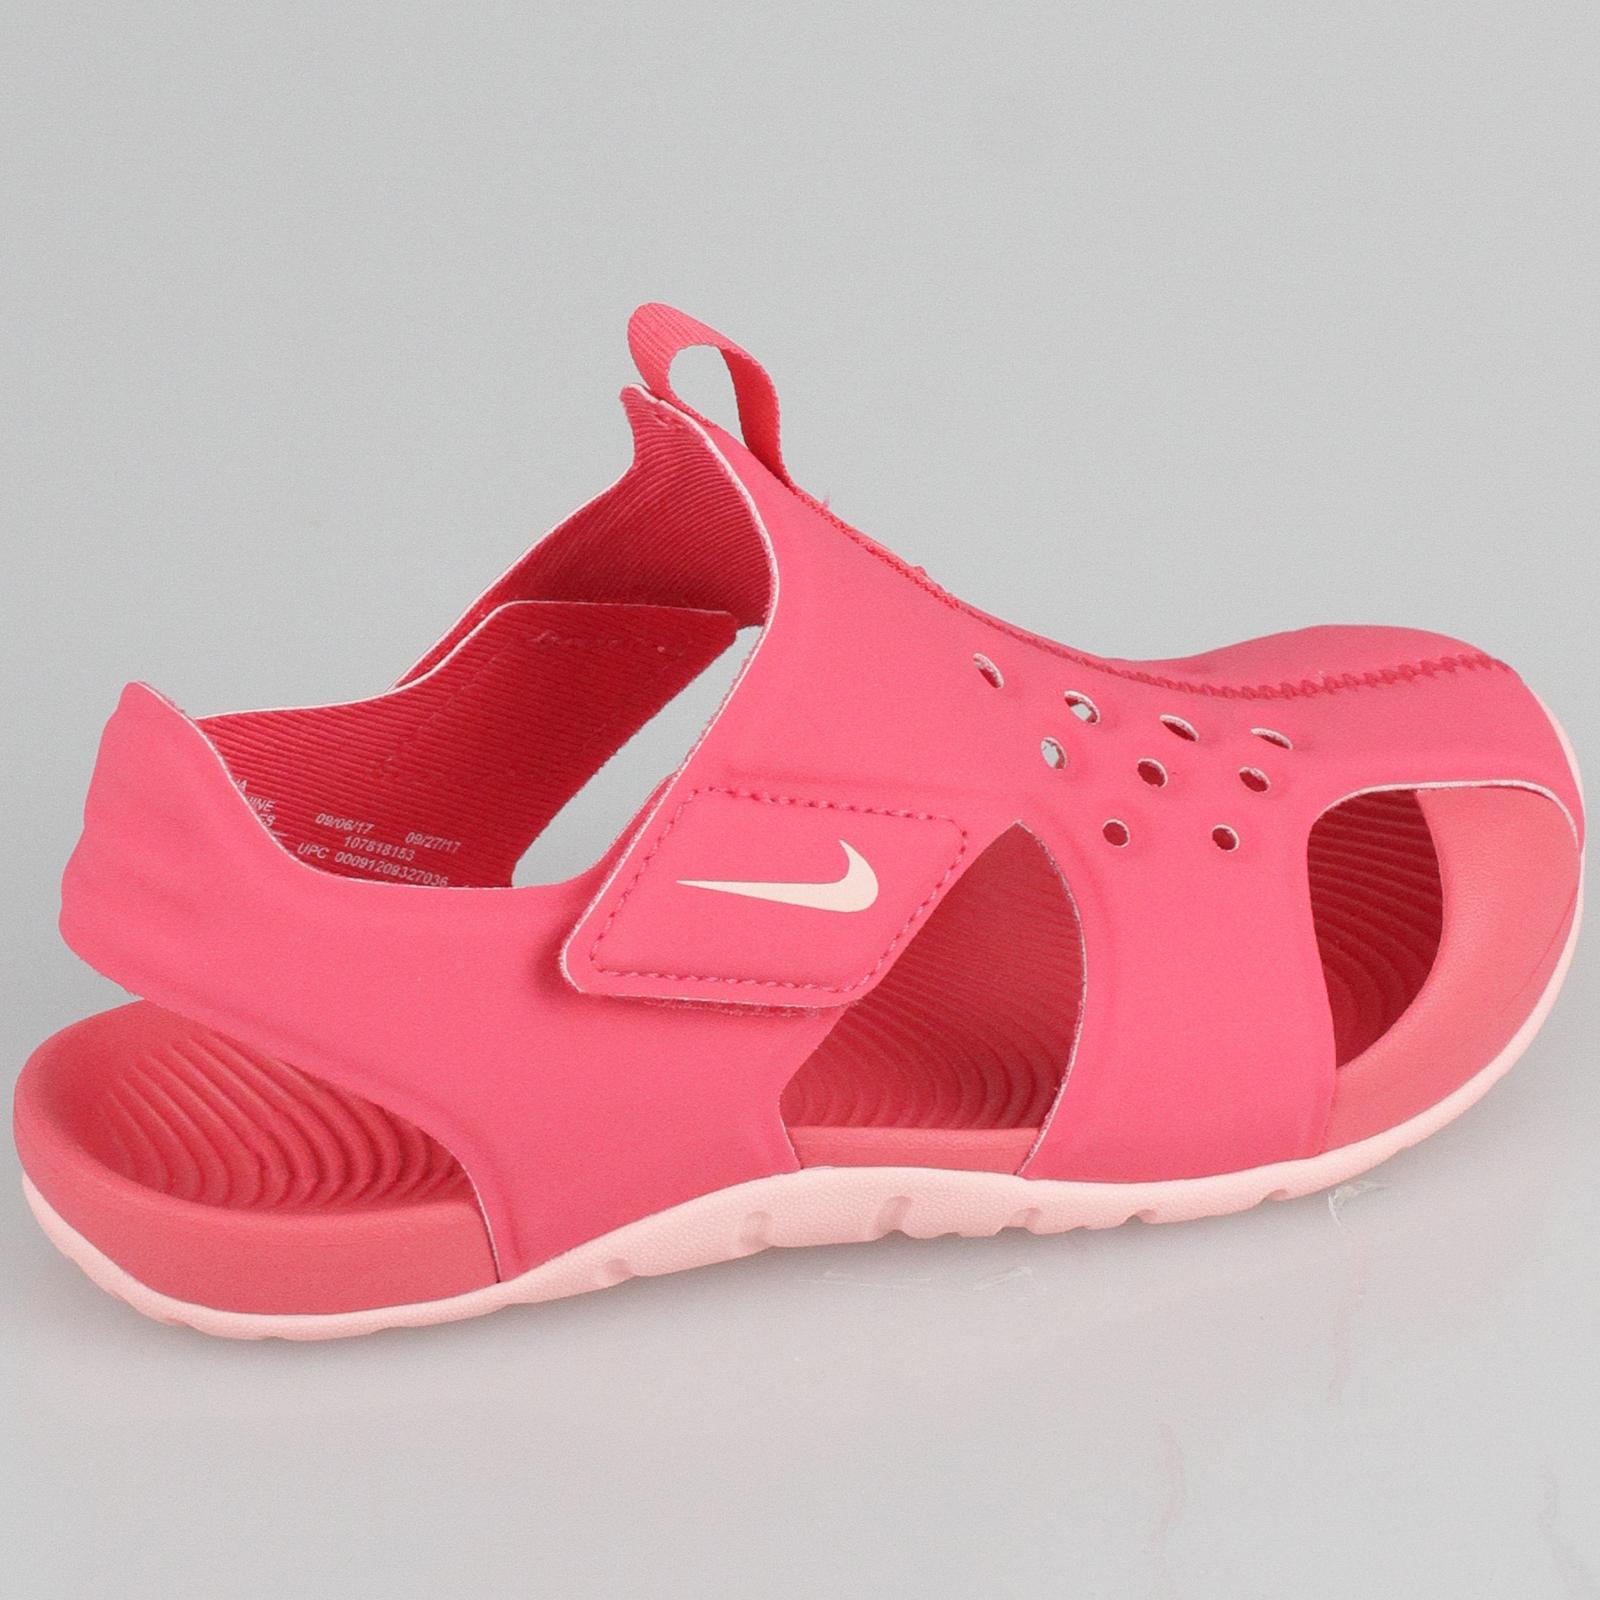 df4c004095762 Sandale copii Nike Sunray Protect 2 943828-600 - produs Nou ...